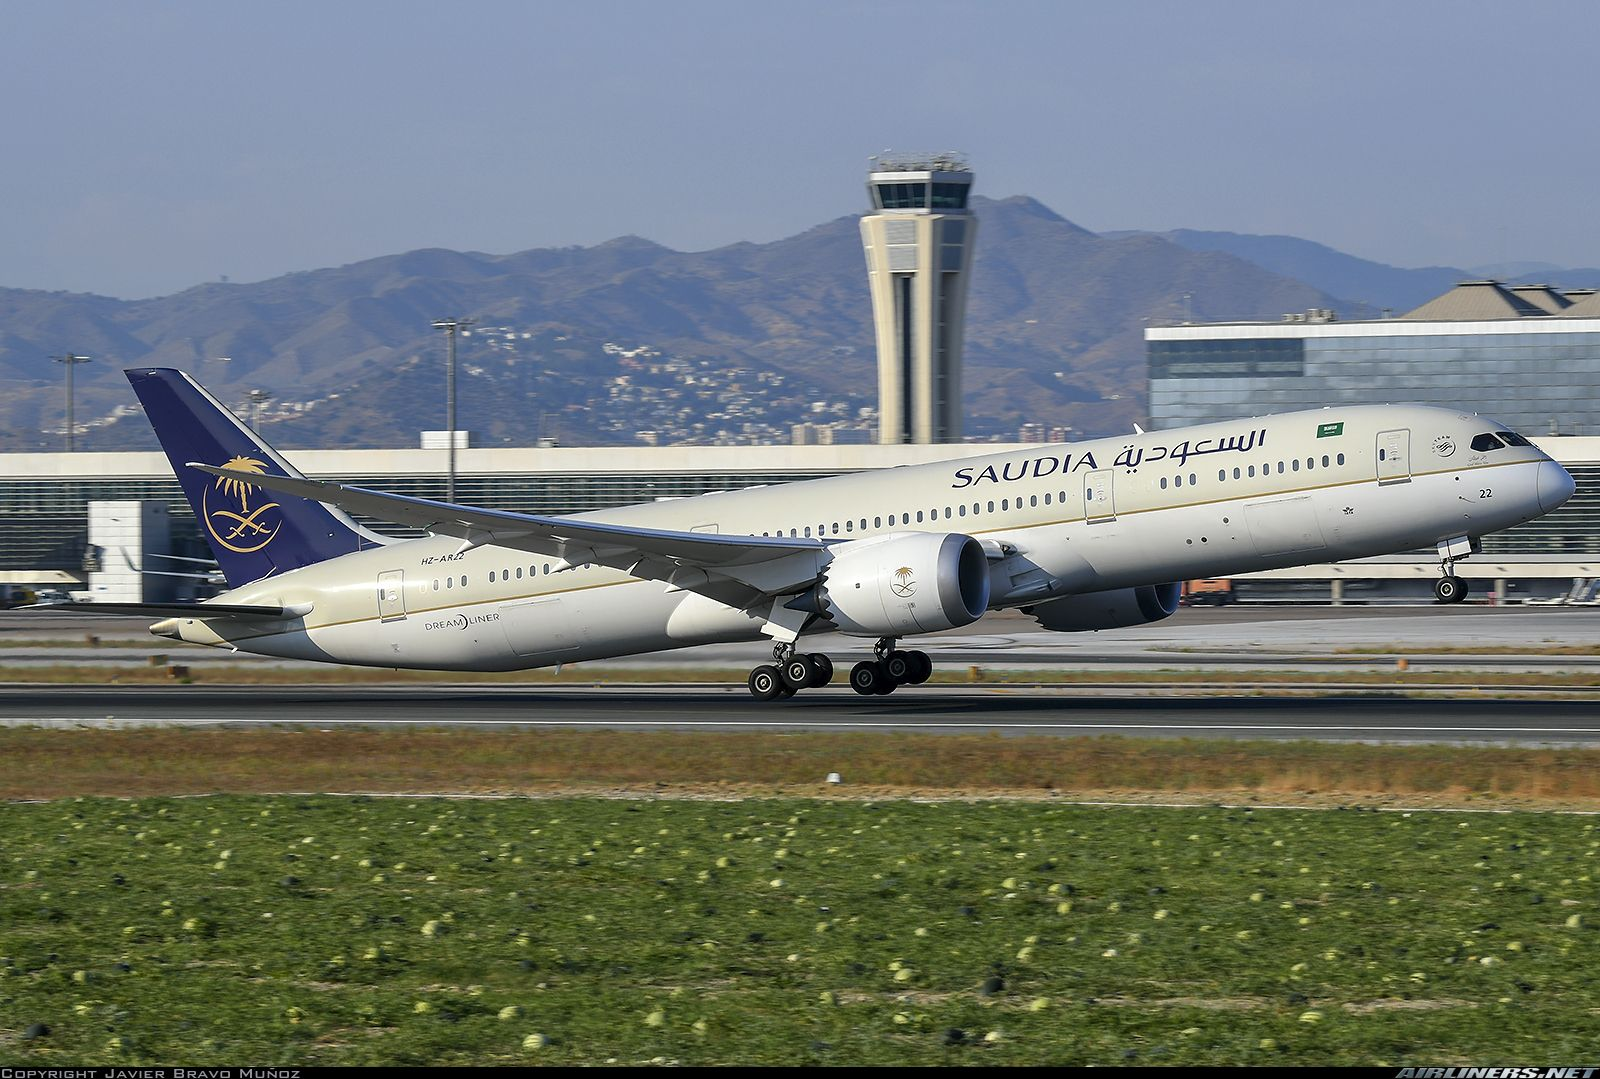 Boeing 787 9 Dreamliner Saudi Arabian Aviation Photo 5269173 Airliners Net Boeing 787 9 Dreamliner Boeing 787 Boeing